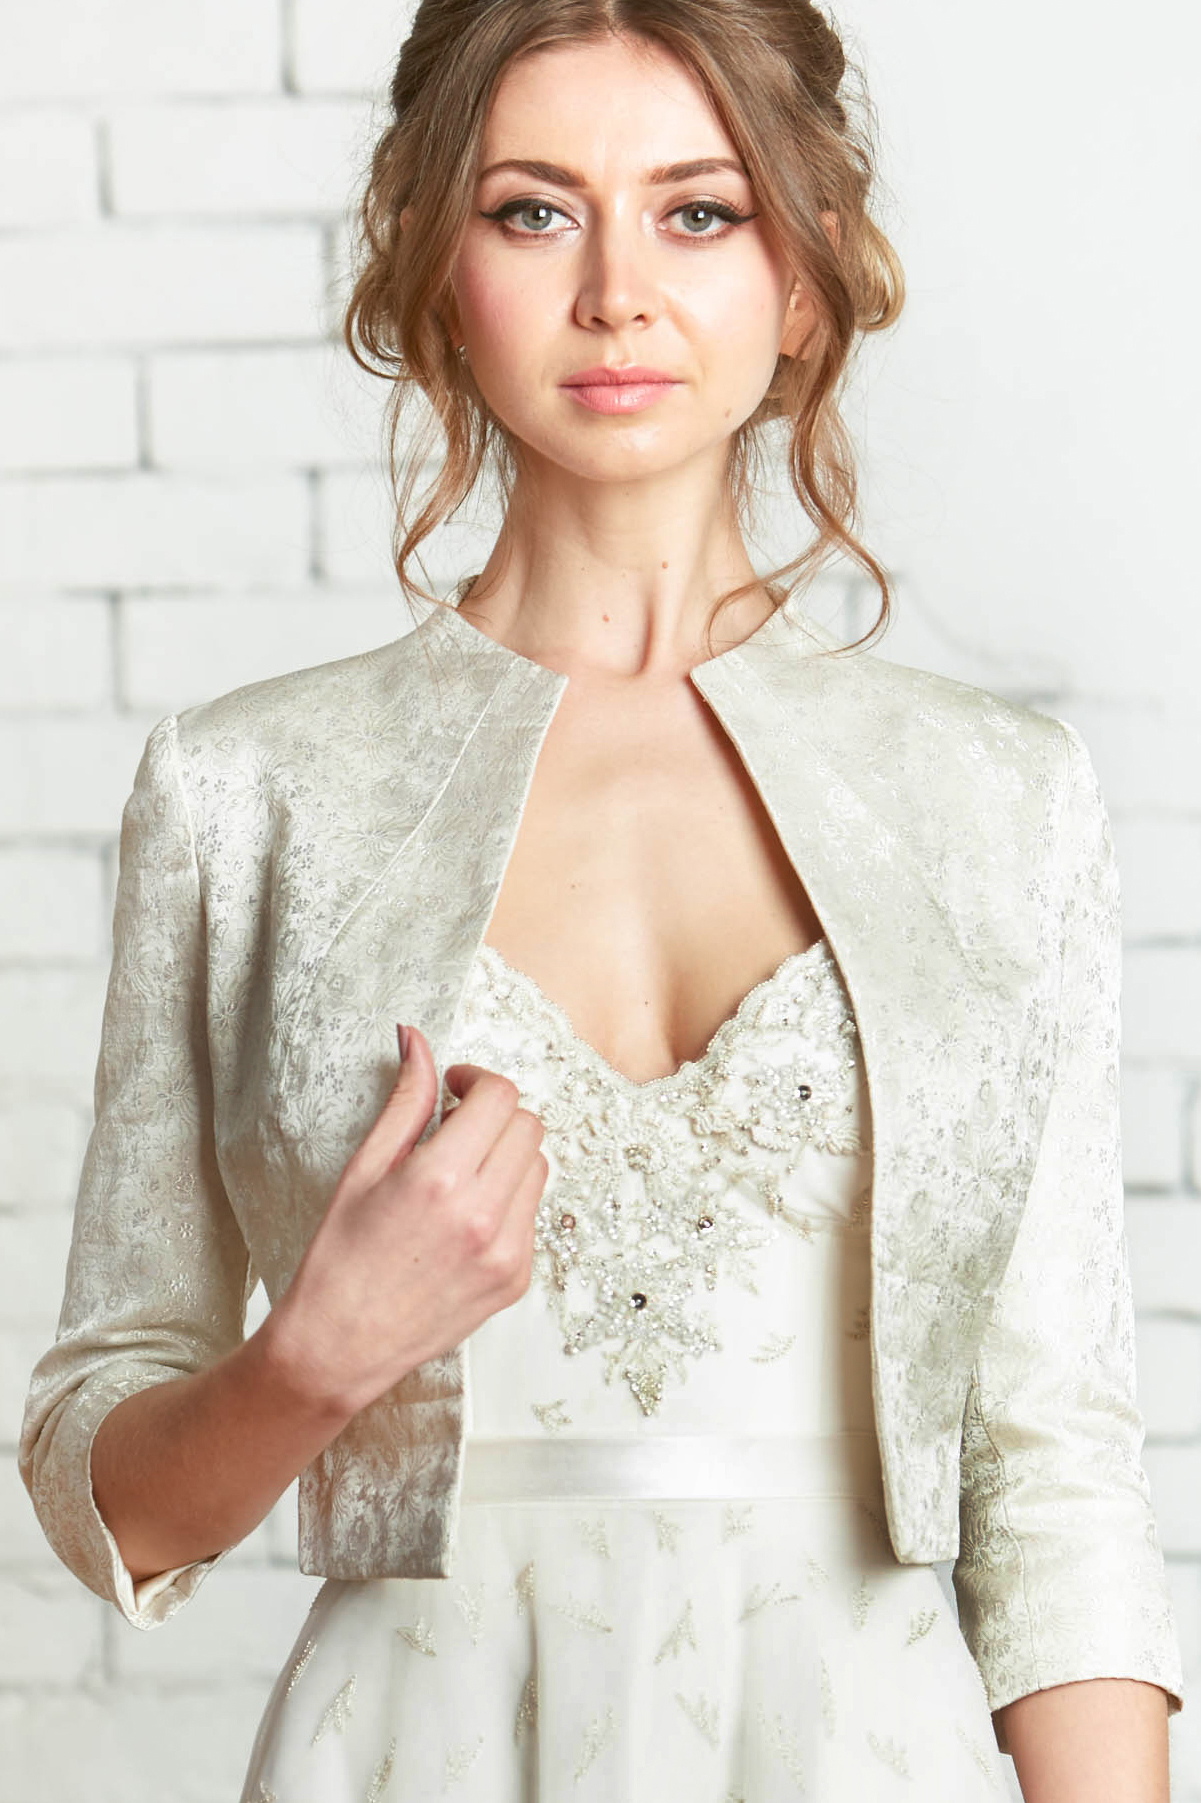 ValenciaJacket-1front_Jacquard_Wedding_Coverup_Chic_Modern_Bride.jpg